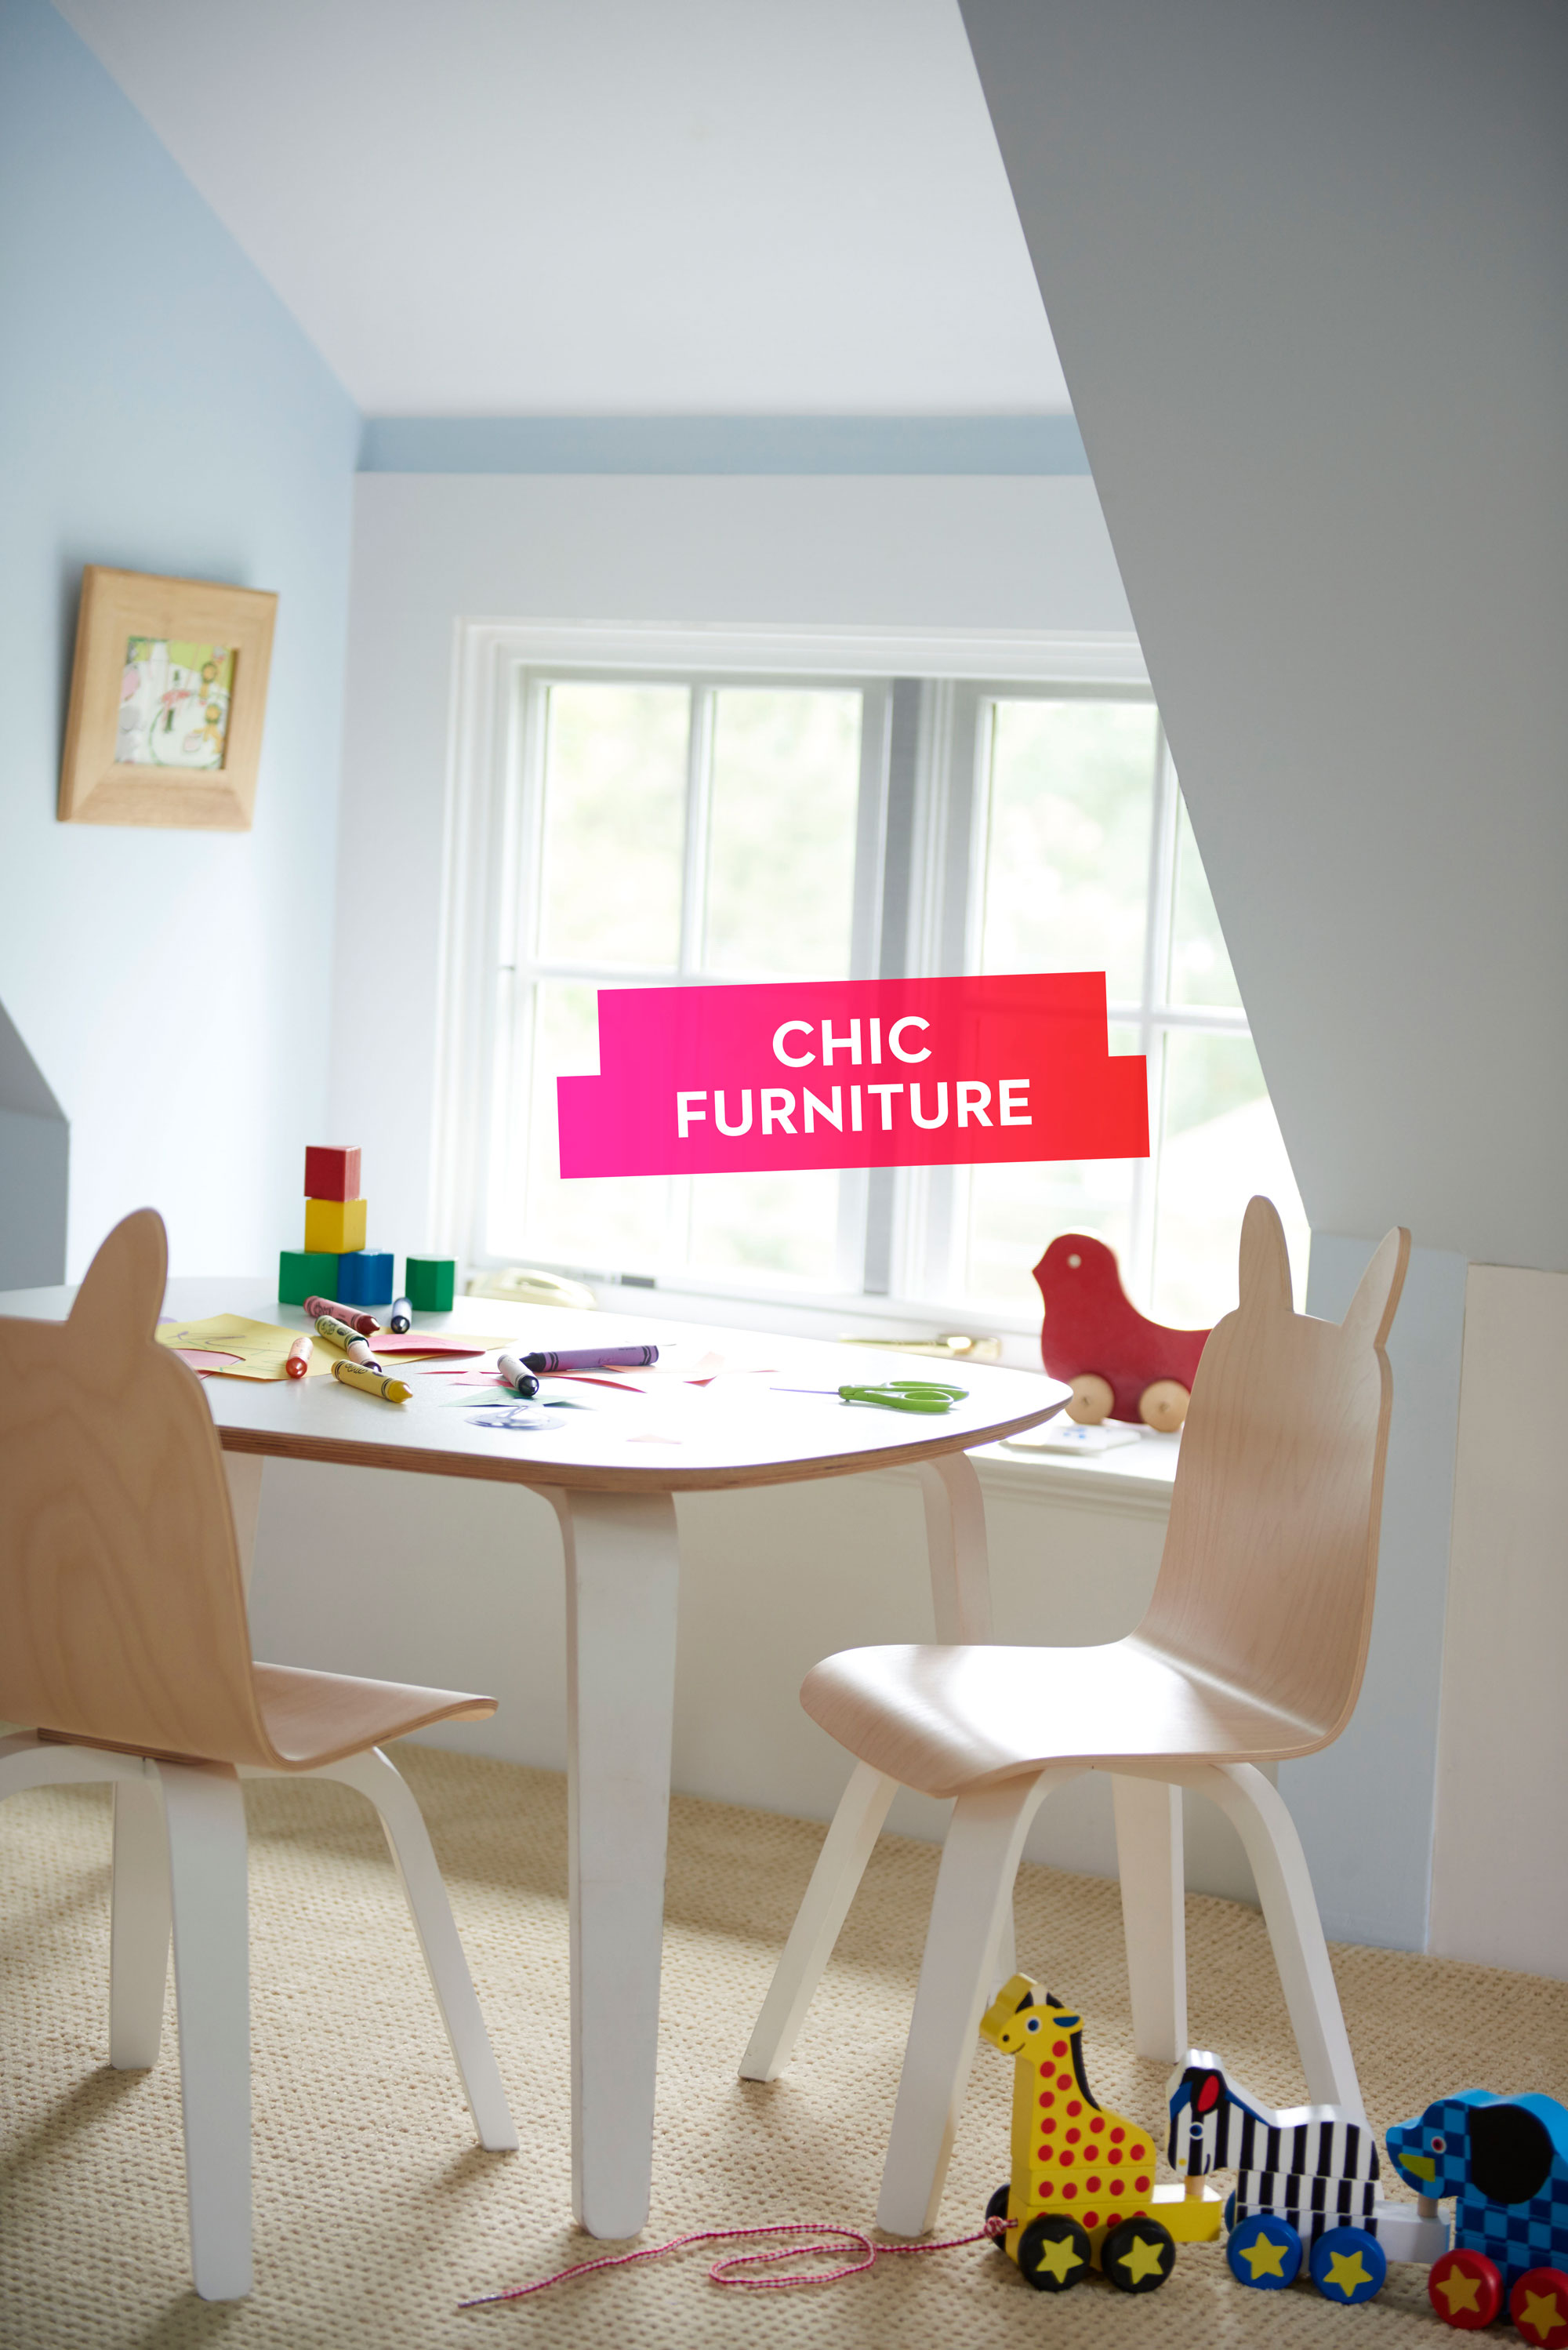 Chic Ways to Design a Kids Bedroom - Kids Bedroom Decor Ideas